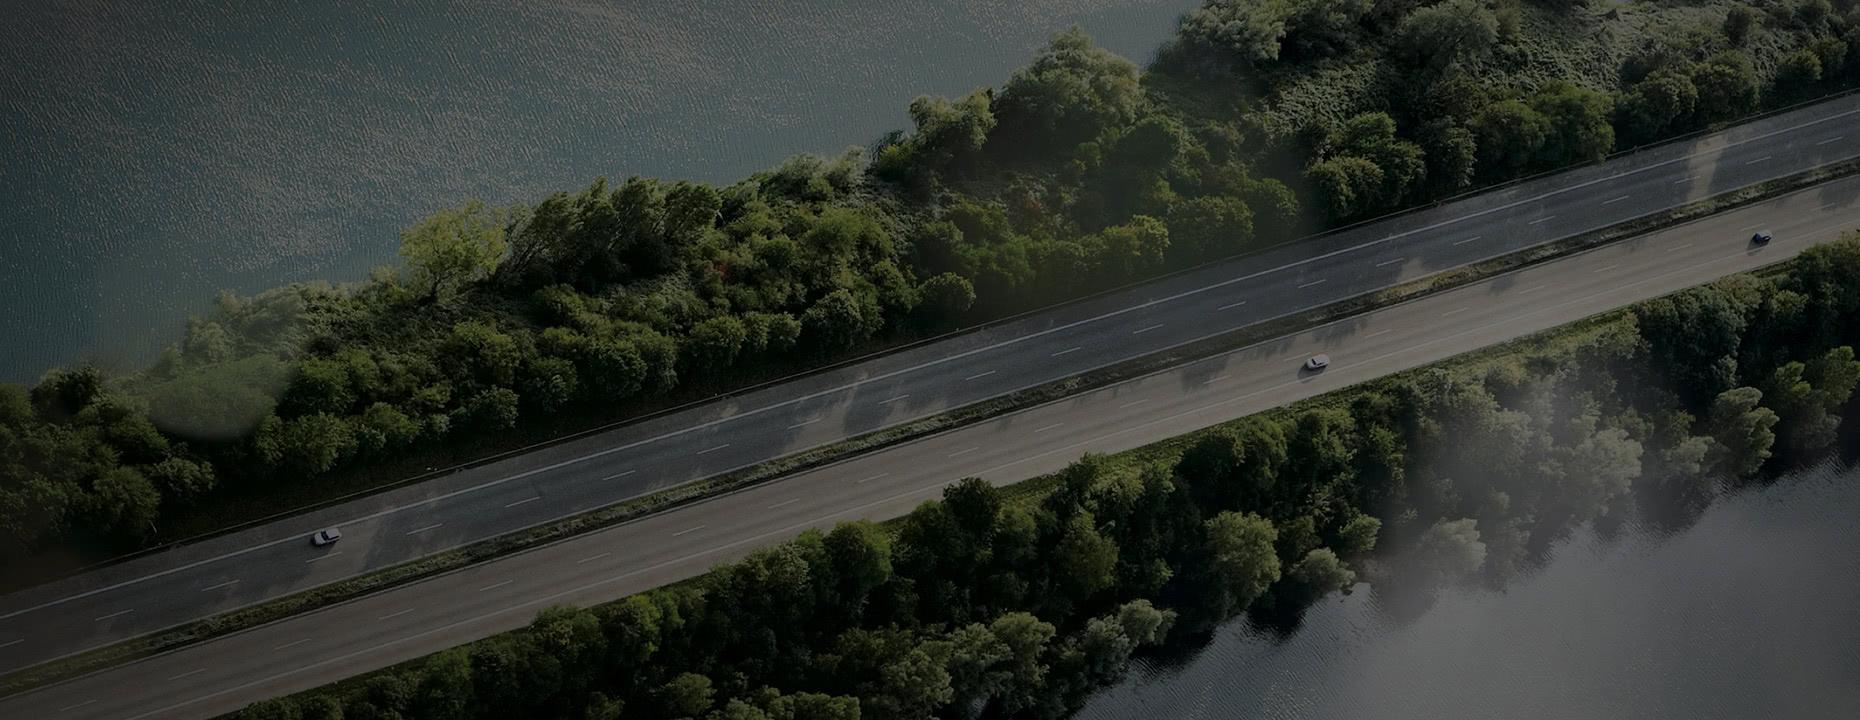 Hyundai Motor представила кросовер Kona Hybrid | Техноцентр «Навигатор» - фото 10